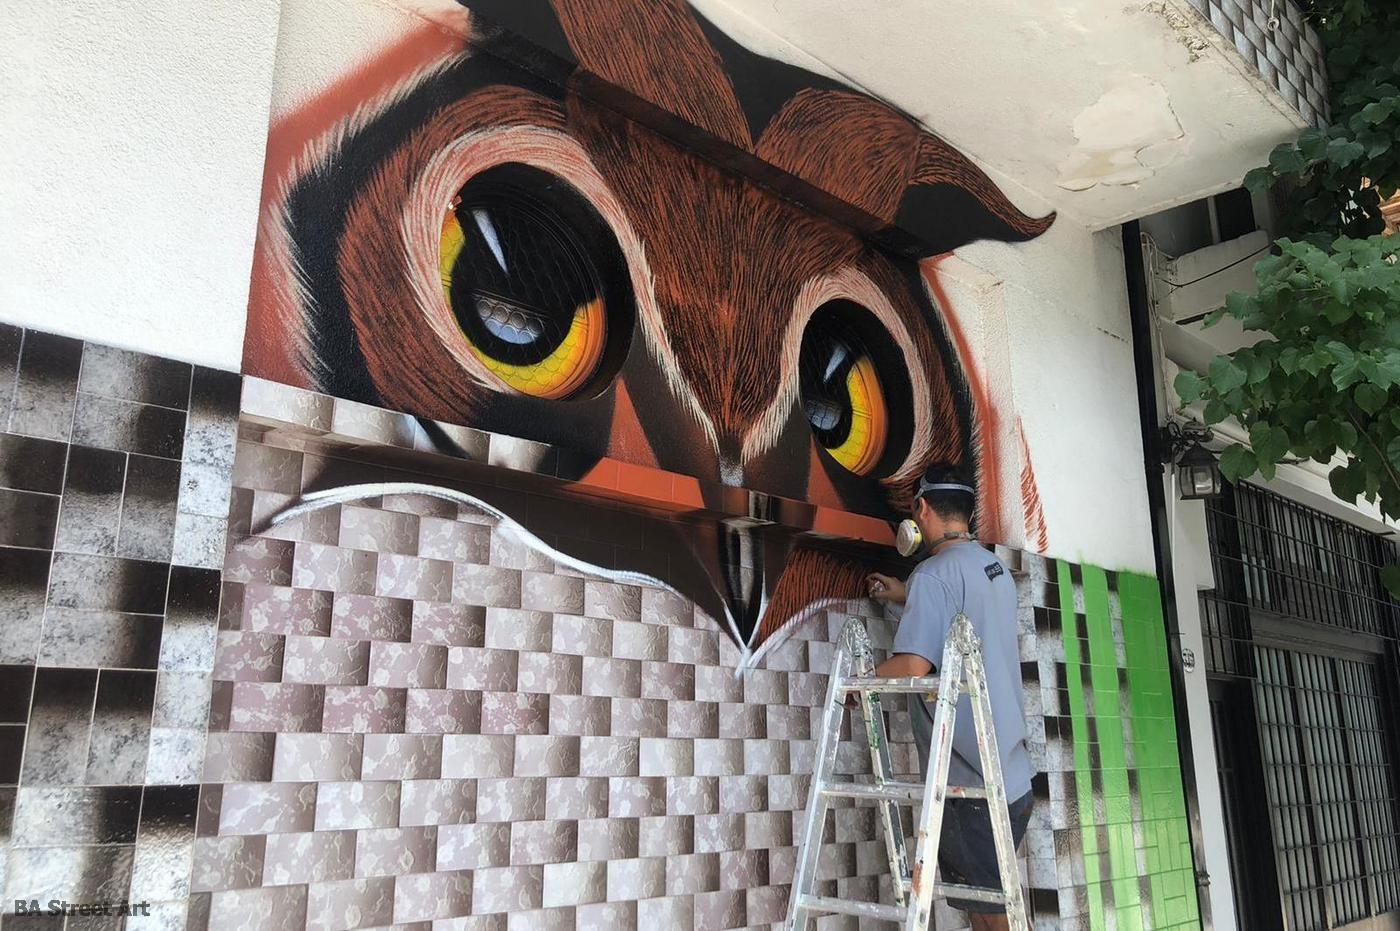 animal mural owl buho buenos aires street art buenosairesstreetart.com